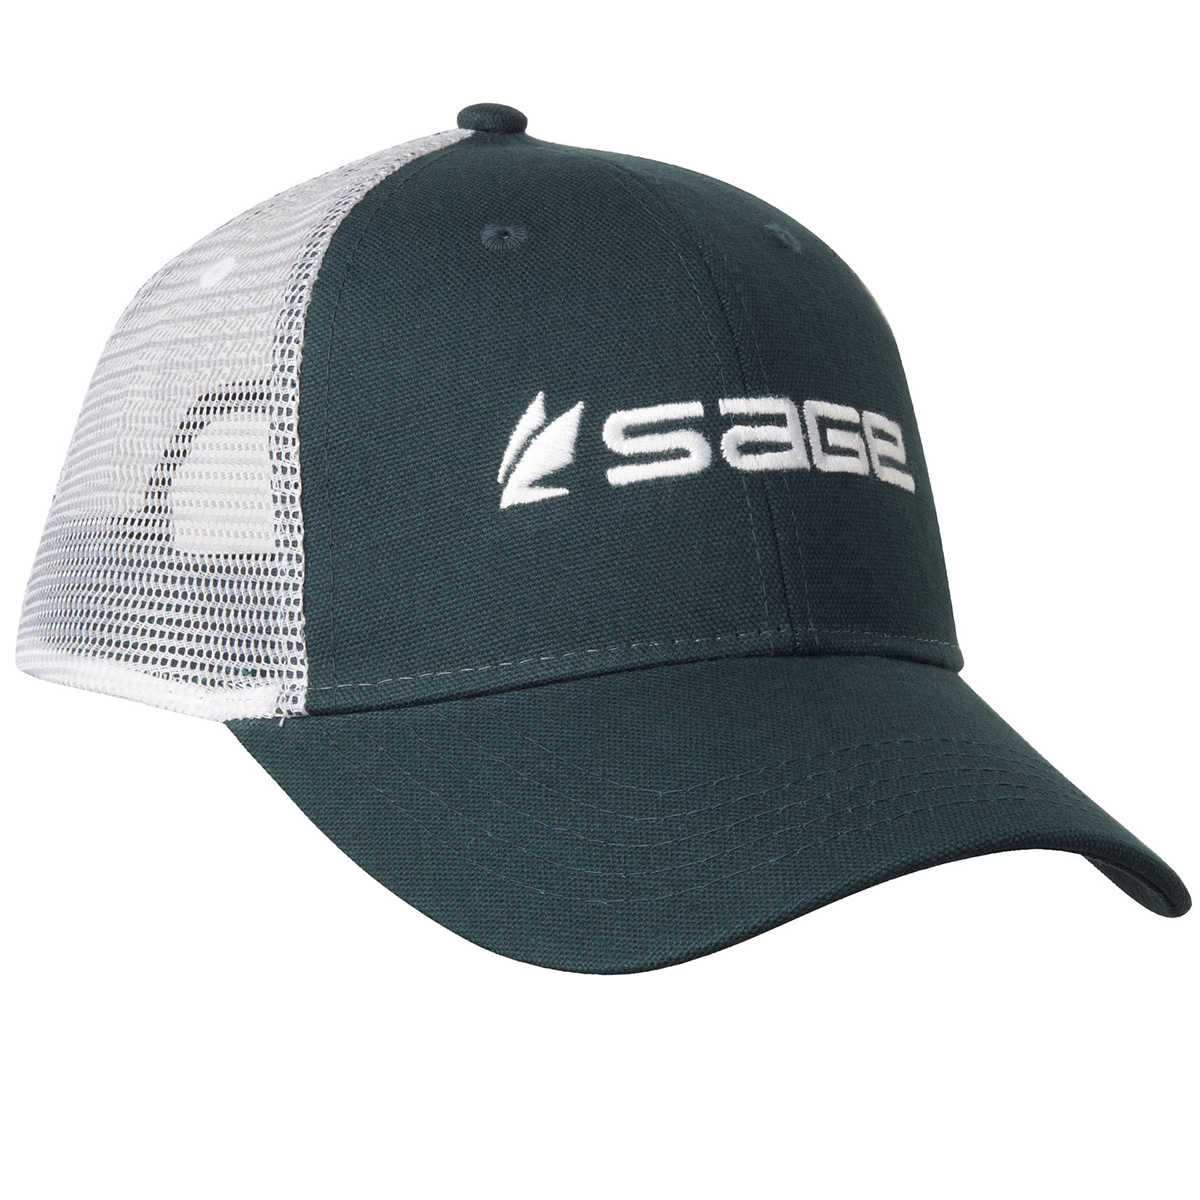 Sage trucker fishing caps ebay for Sage fly fishing hat